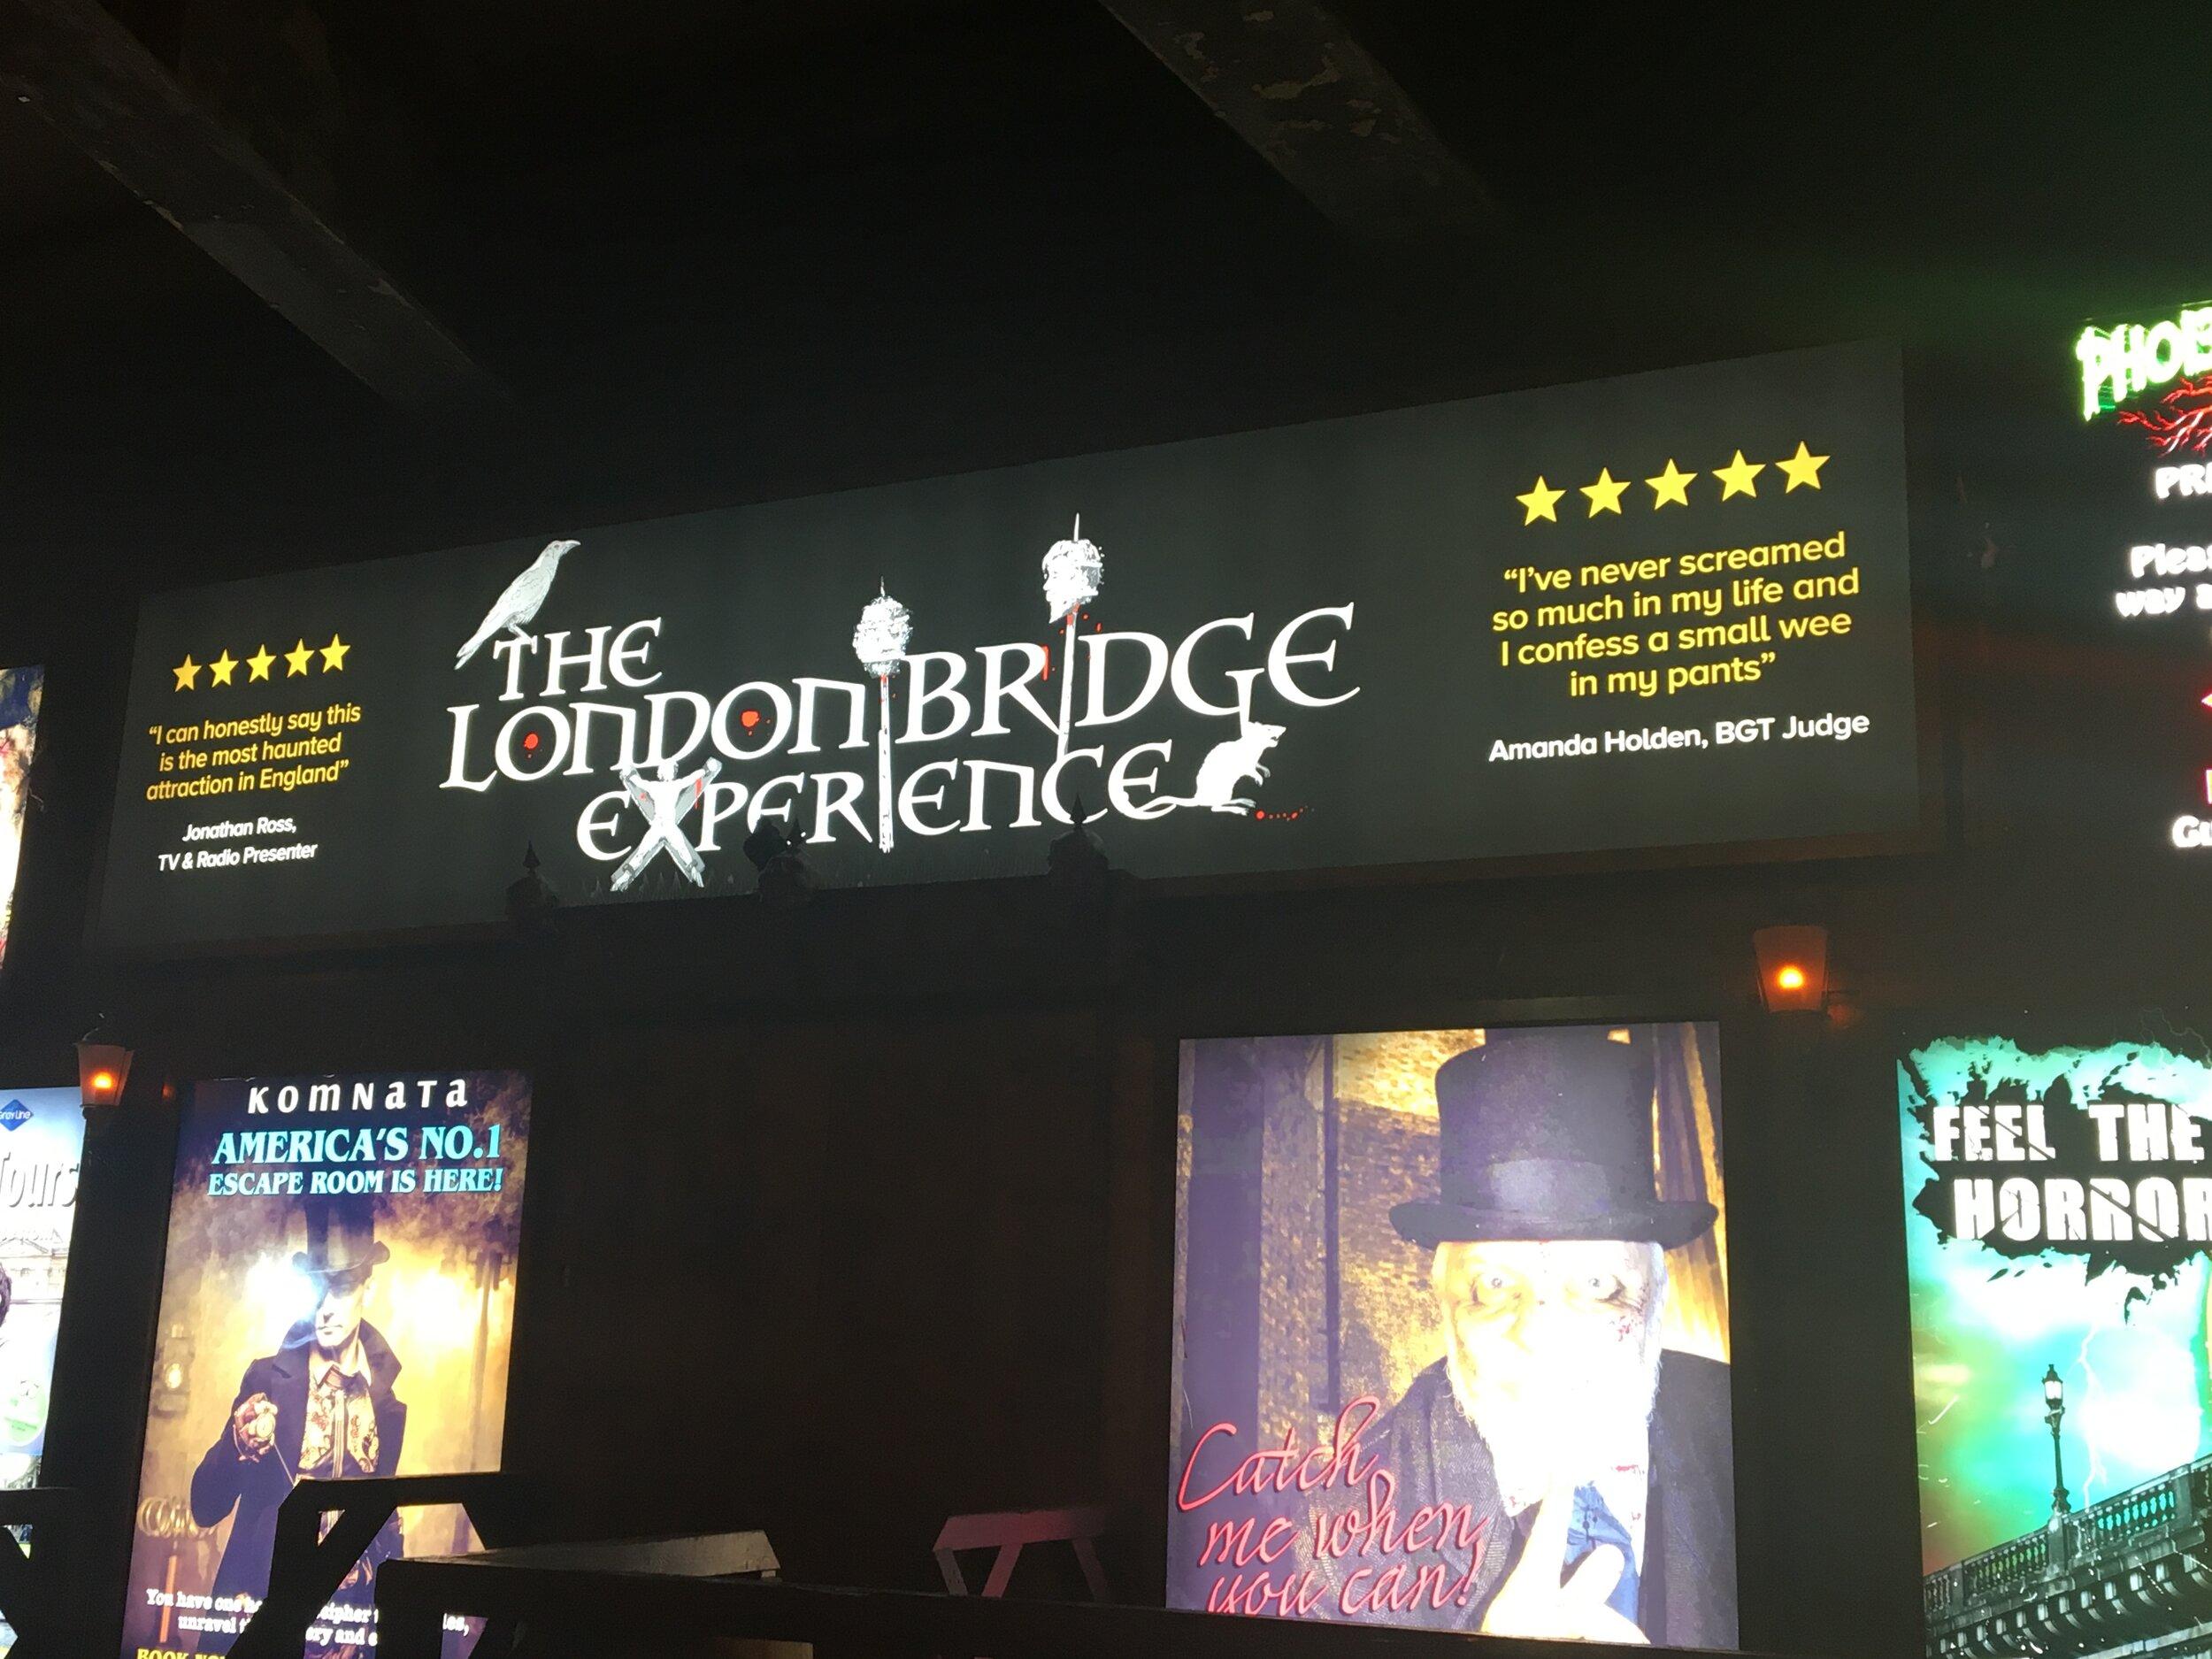 the london bridge experience south london club